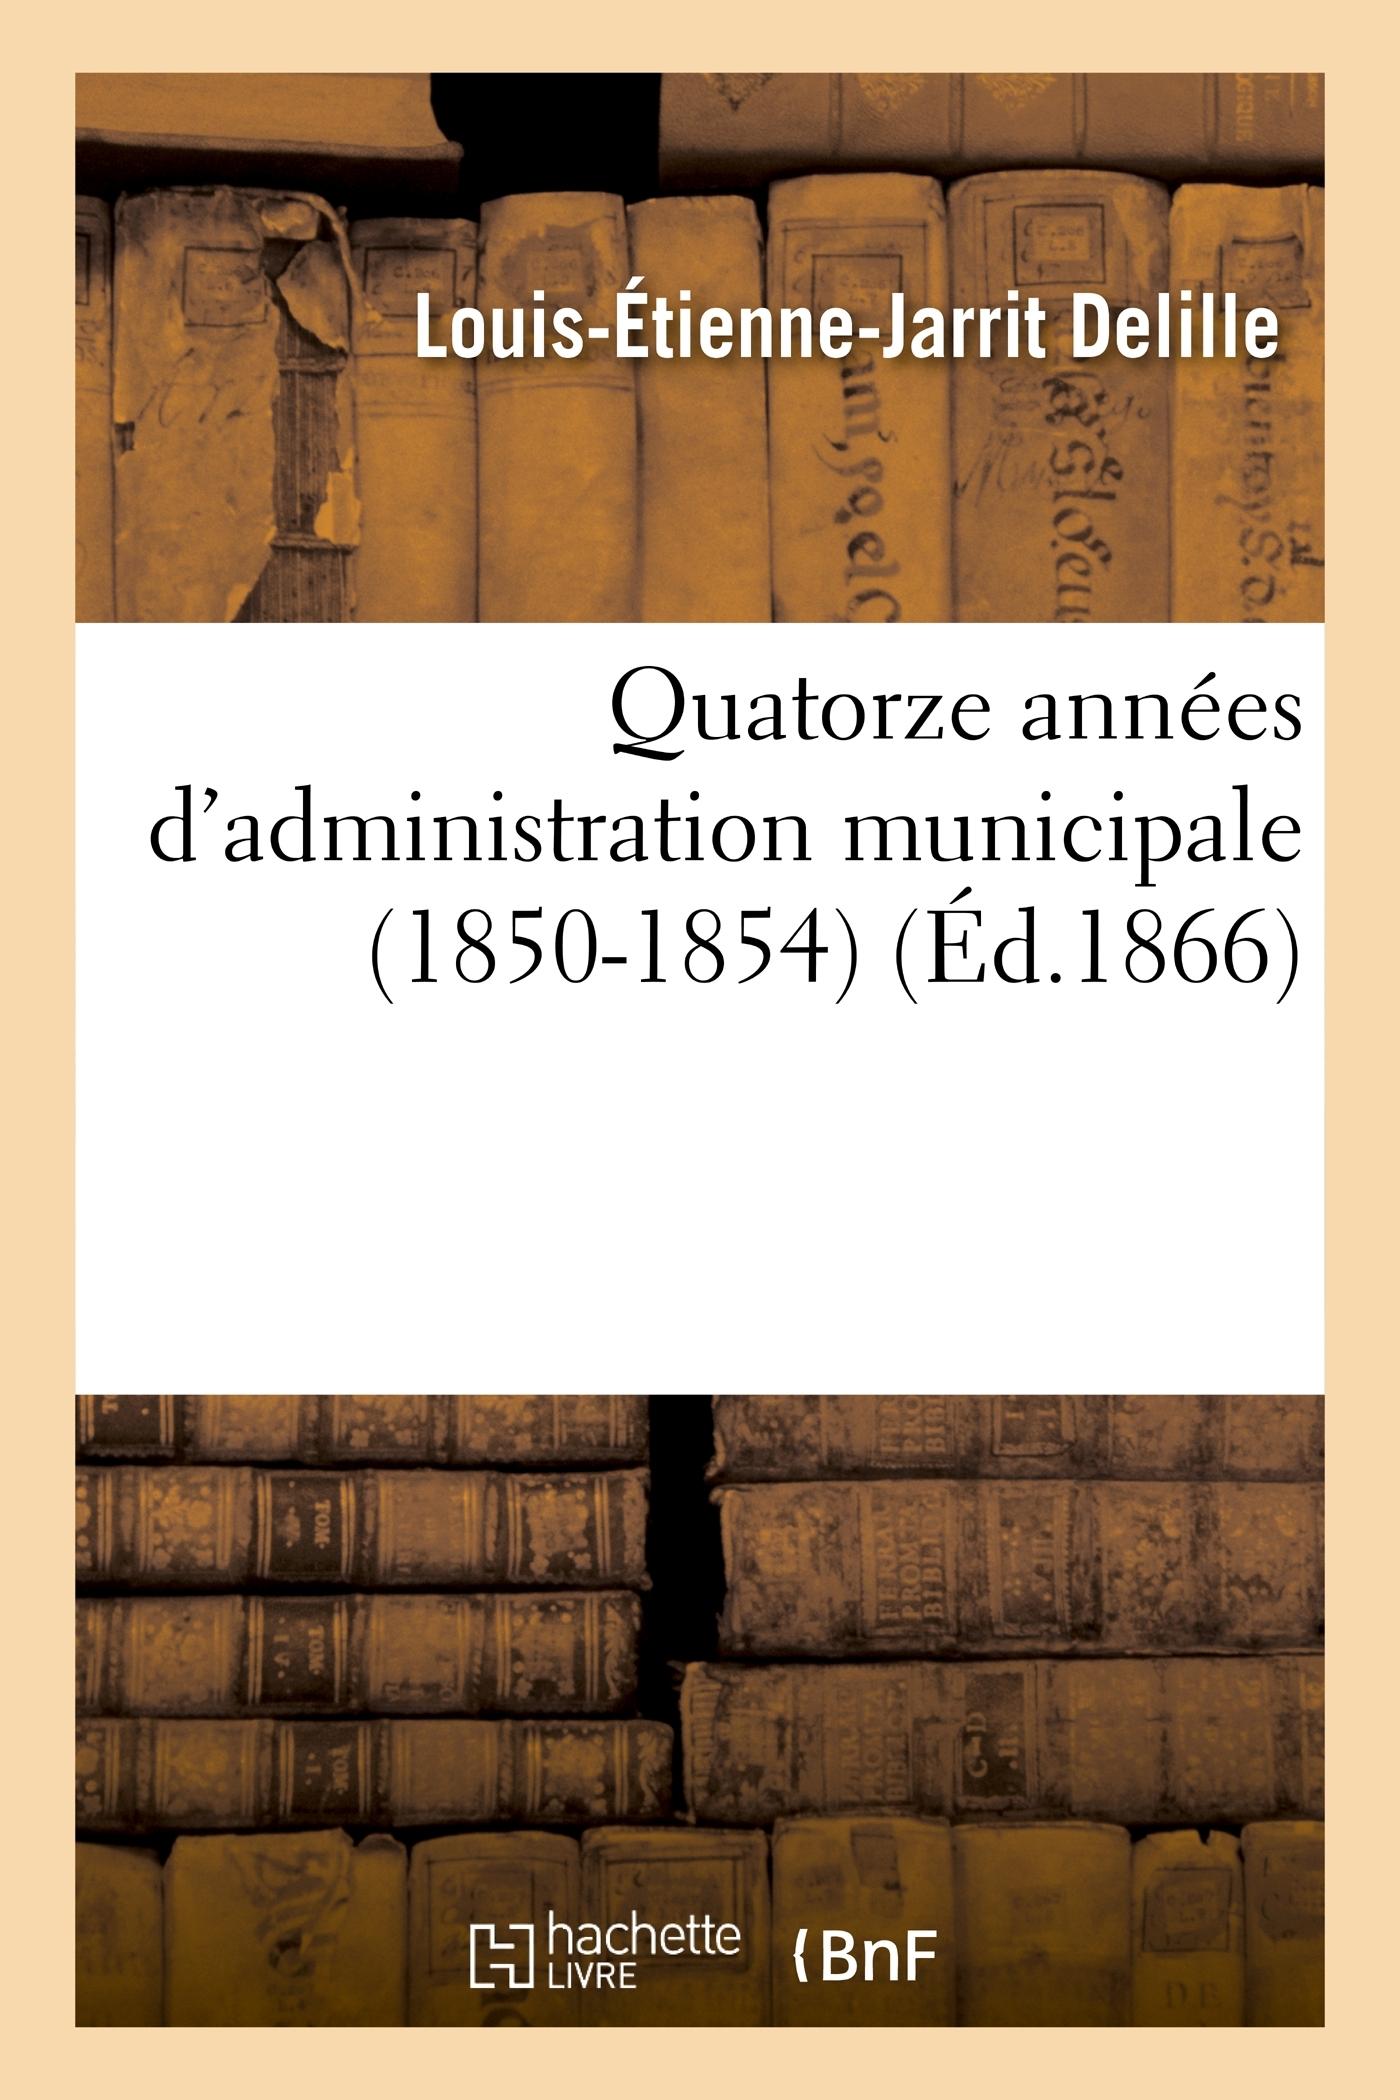 QUATORZE ANNEES D'ADMINISTRATION MUNICIPALE (1850-1854)